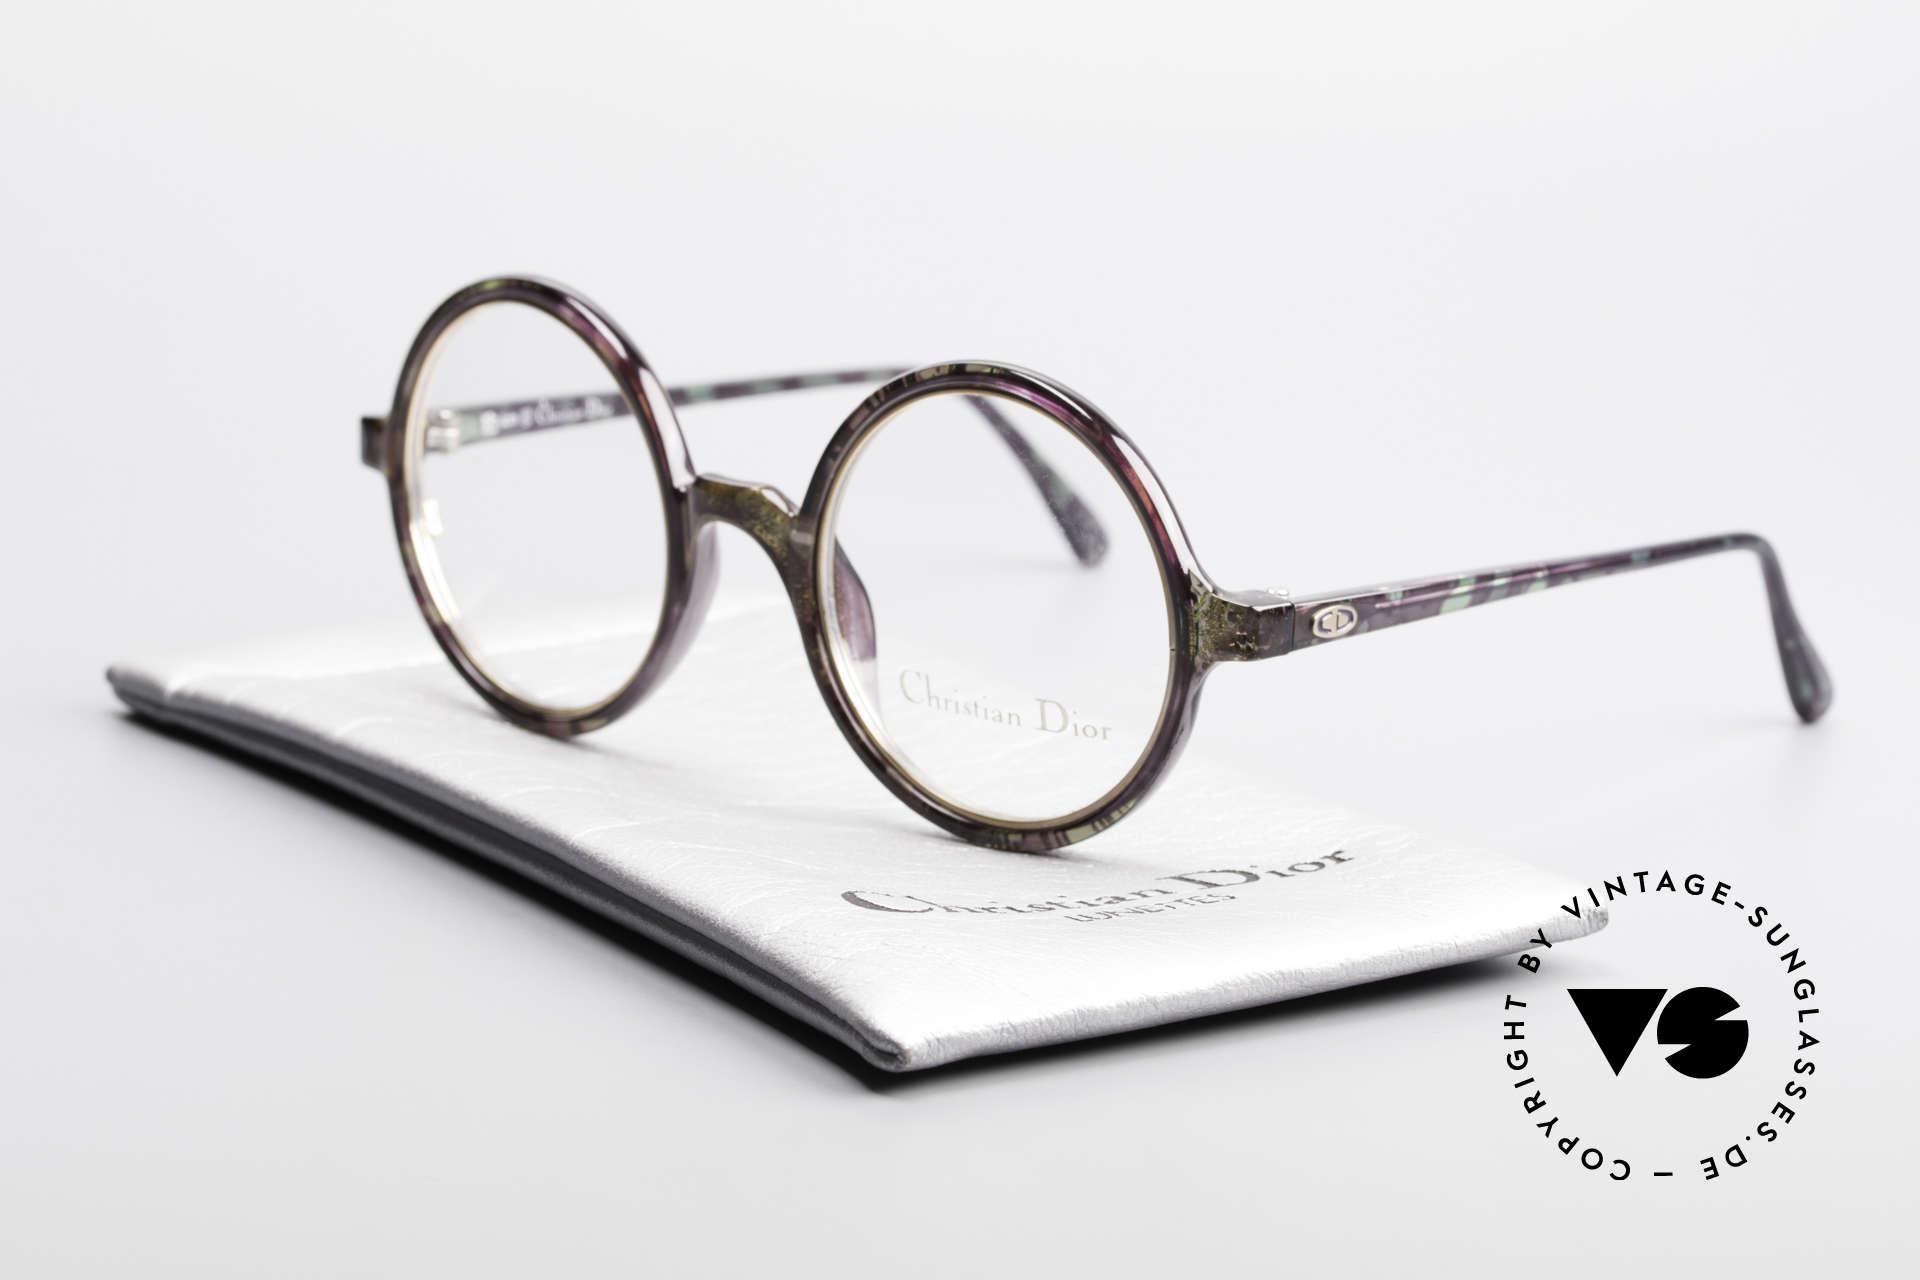 Glasses Christian Dior 2540 Round 90 S Ladies Eyeglasses